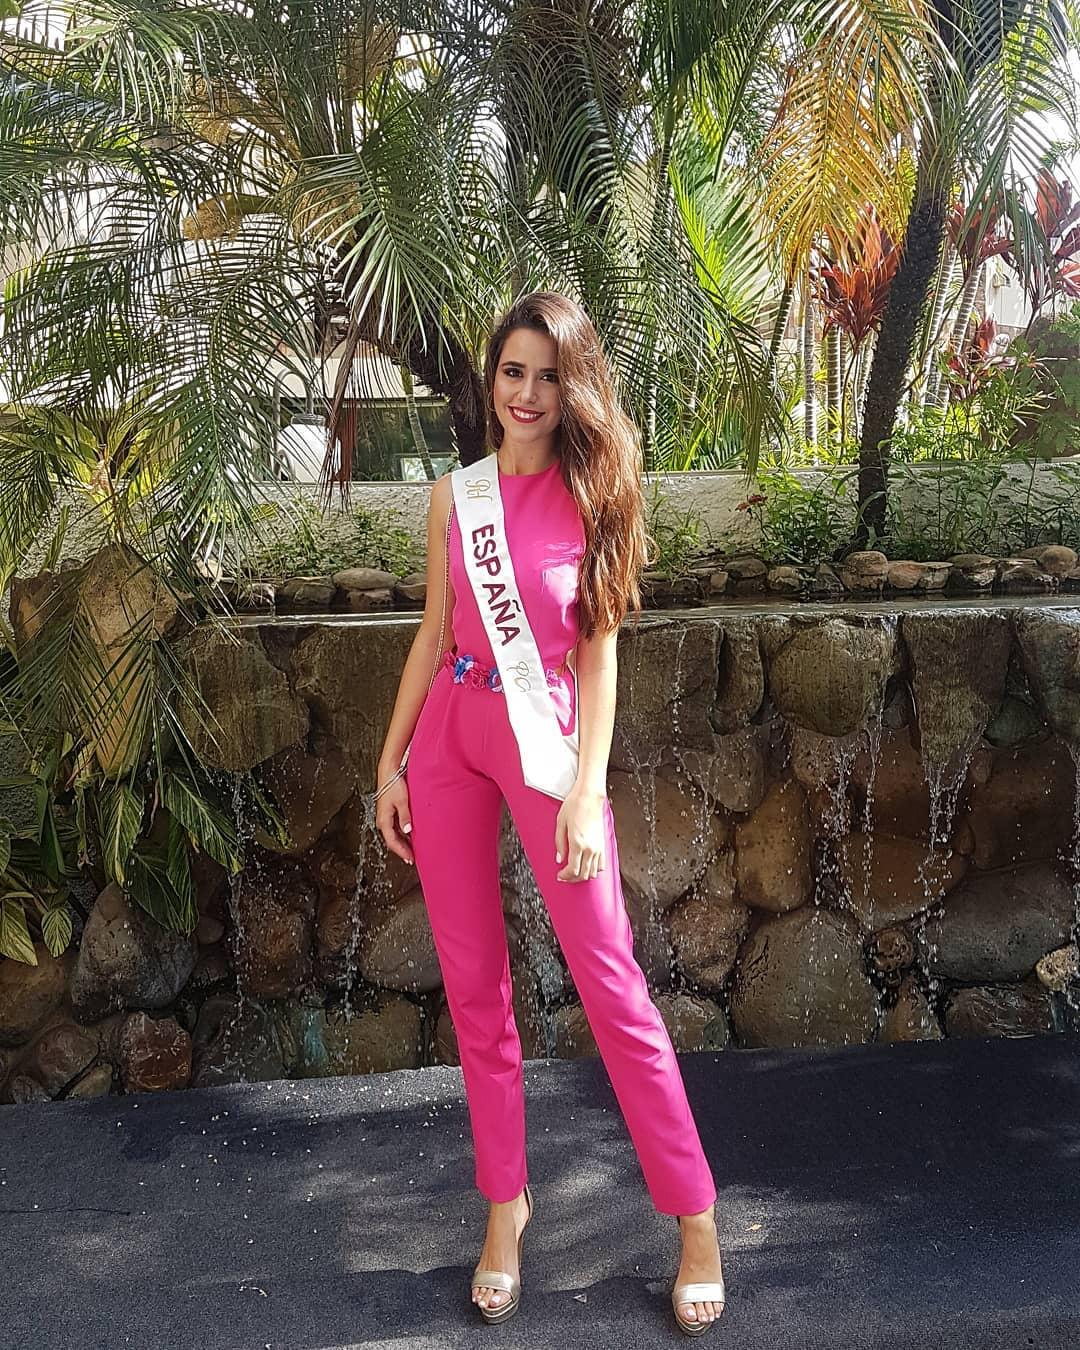 magnolia martinez, miss espana hispanoamericana 2018. - Página 3 43169710